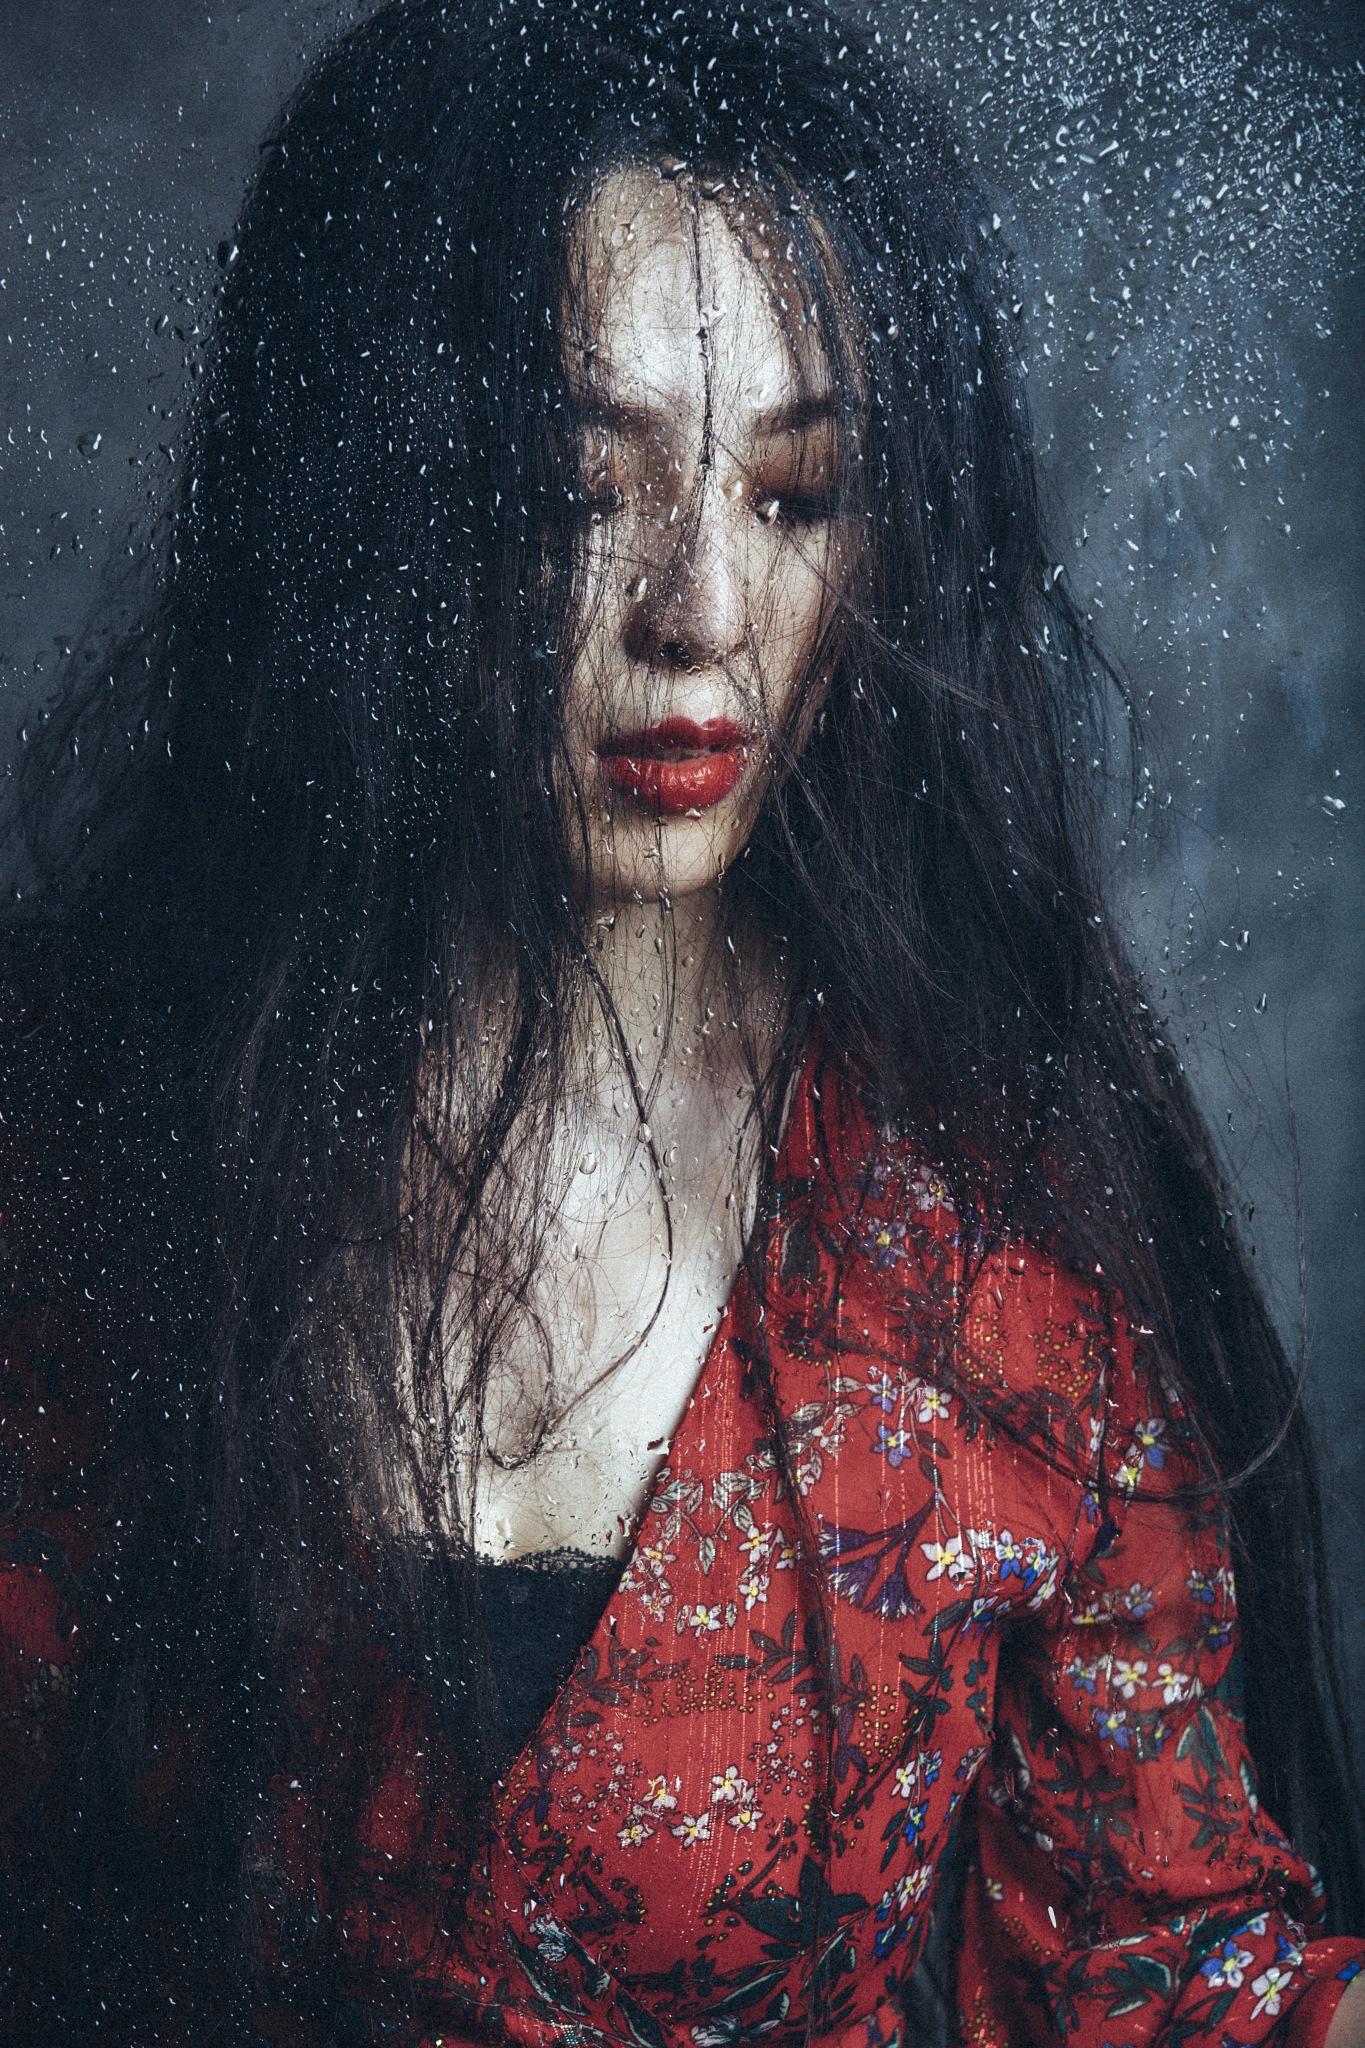 Cry by skirt chiu